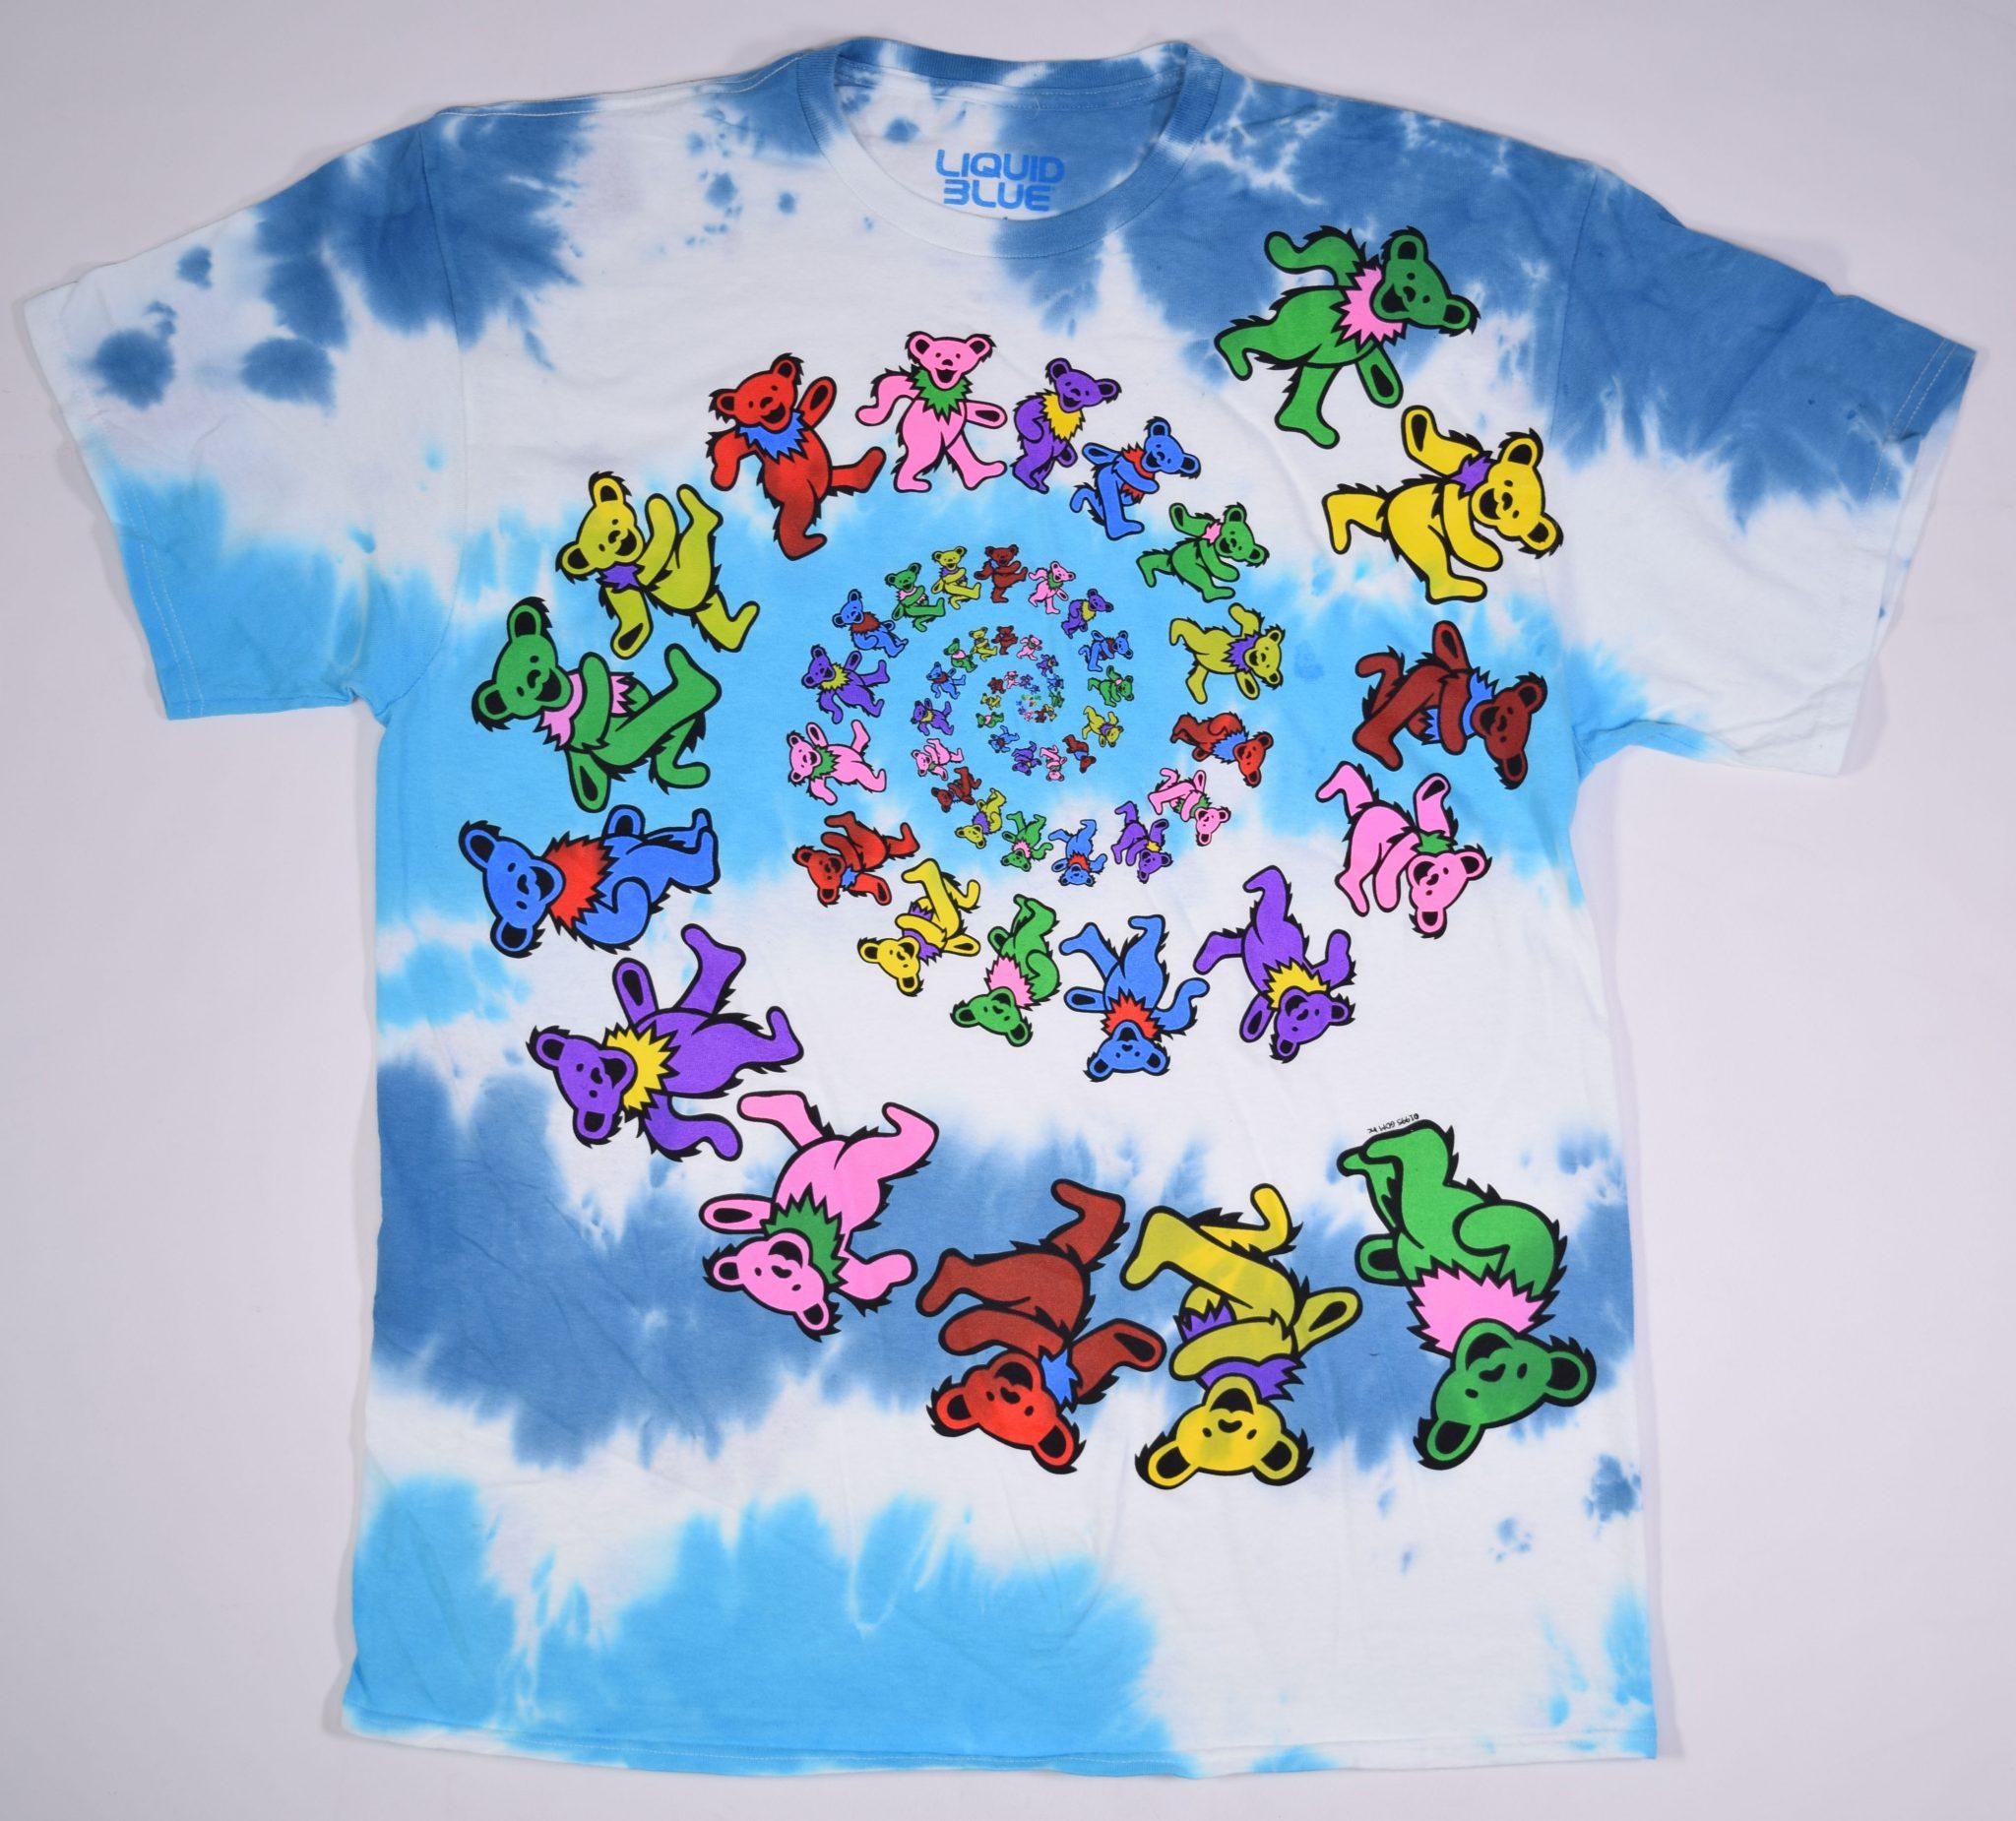 f9a3d1d248e Grateful Dead Spiral Bears Tie Dye T Shirt (2) – Have to Have It Co